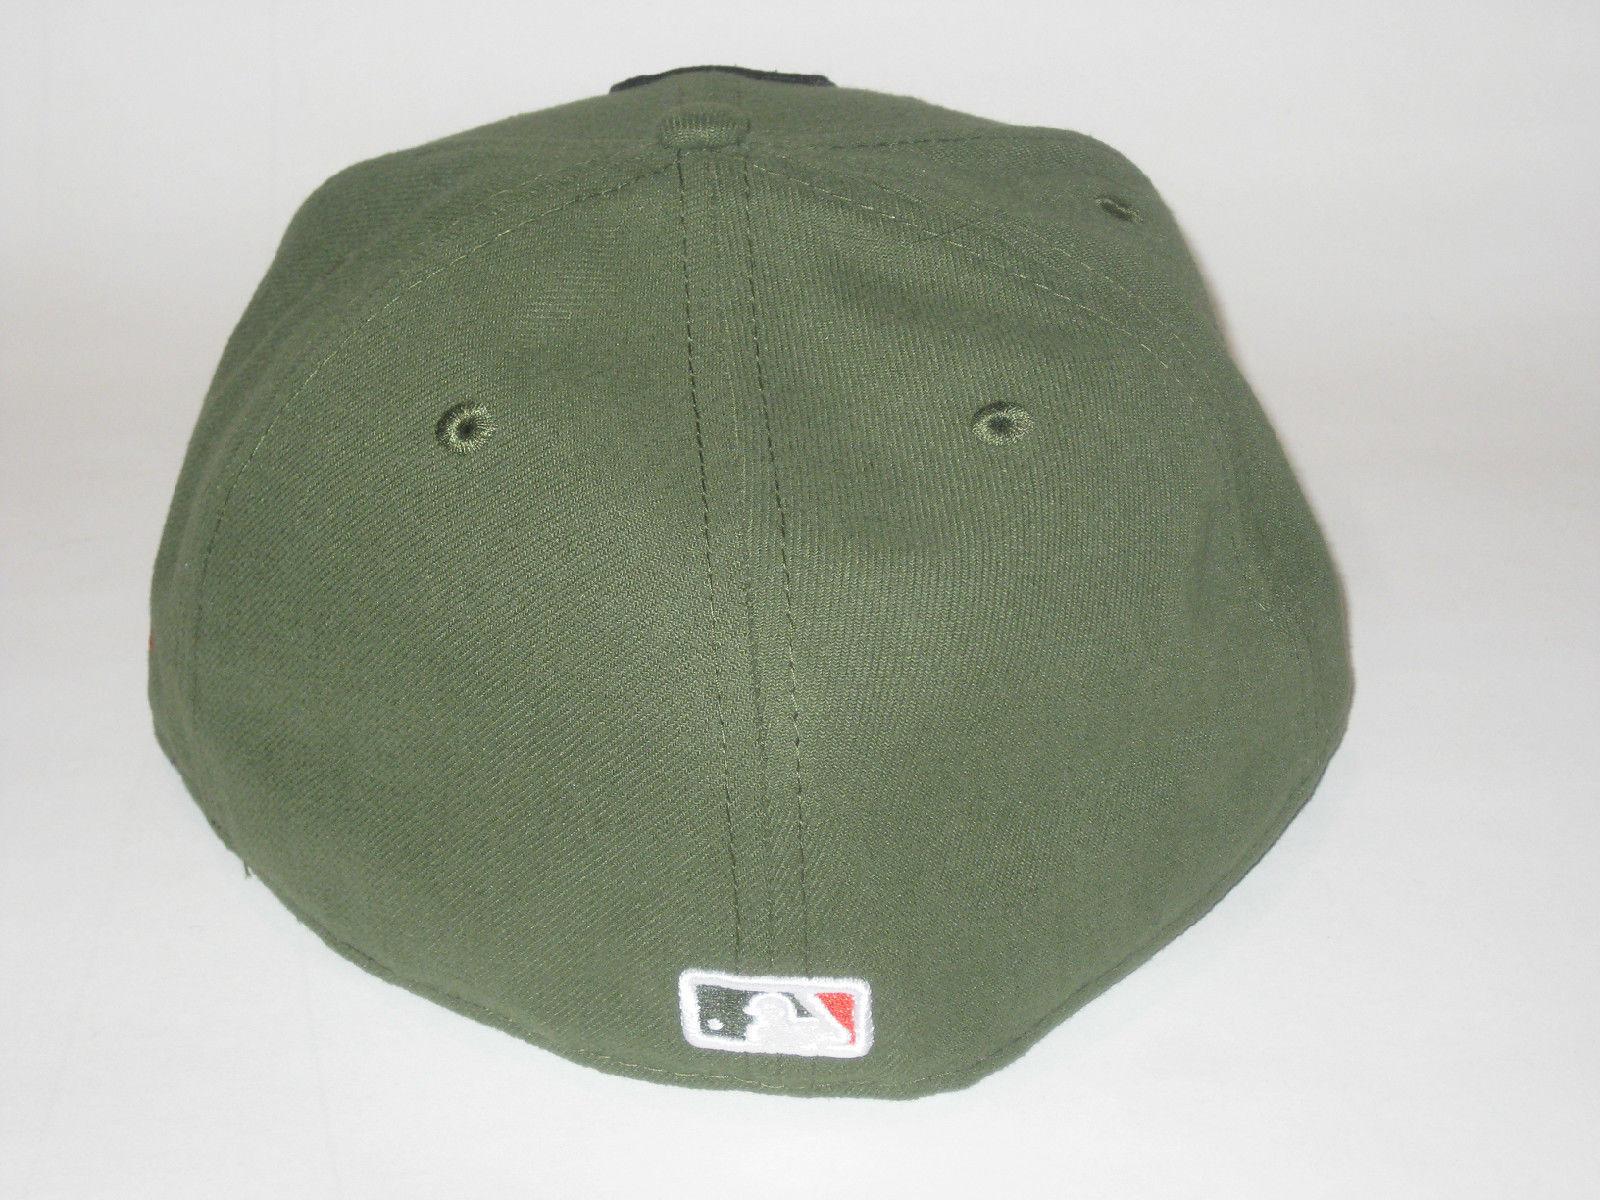 ec47e29da39da NEW ERA SAN FRANCISCO GIANTS RIFLE GREEN FITTED HAT CAP 7 1 4 59FIFTY  BASEBALL